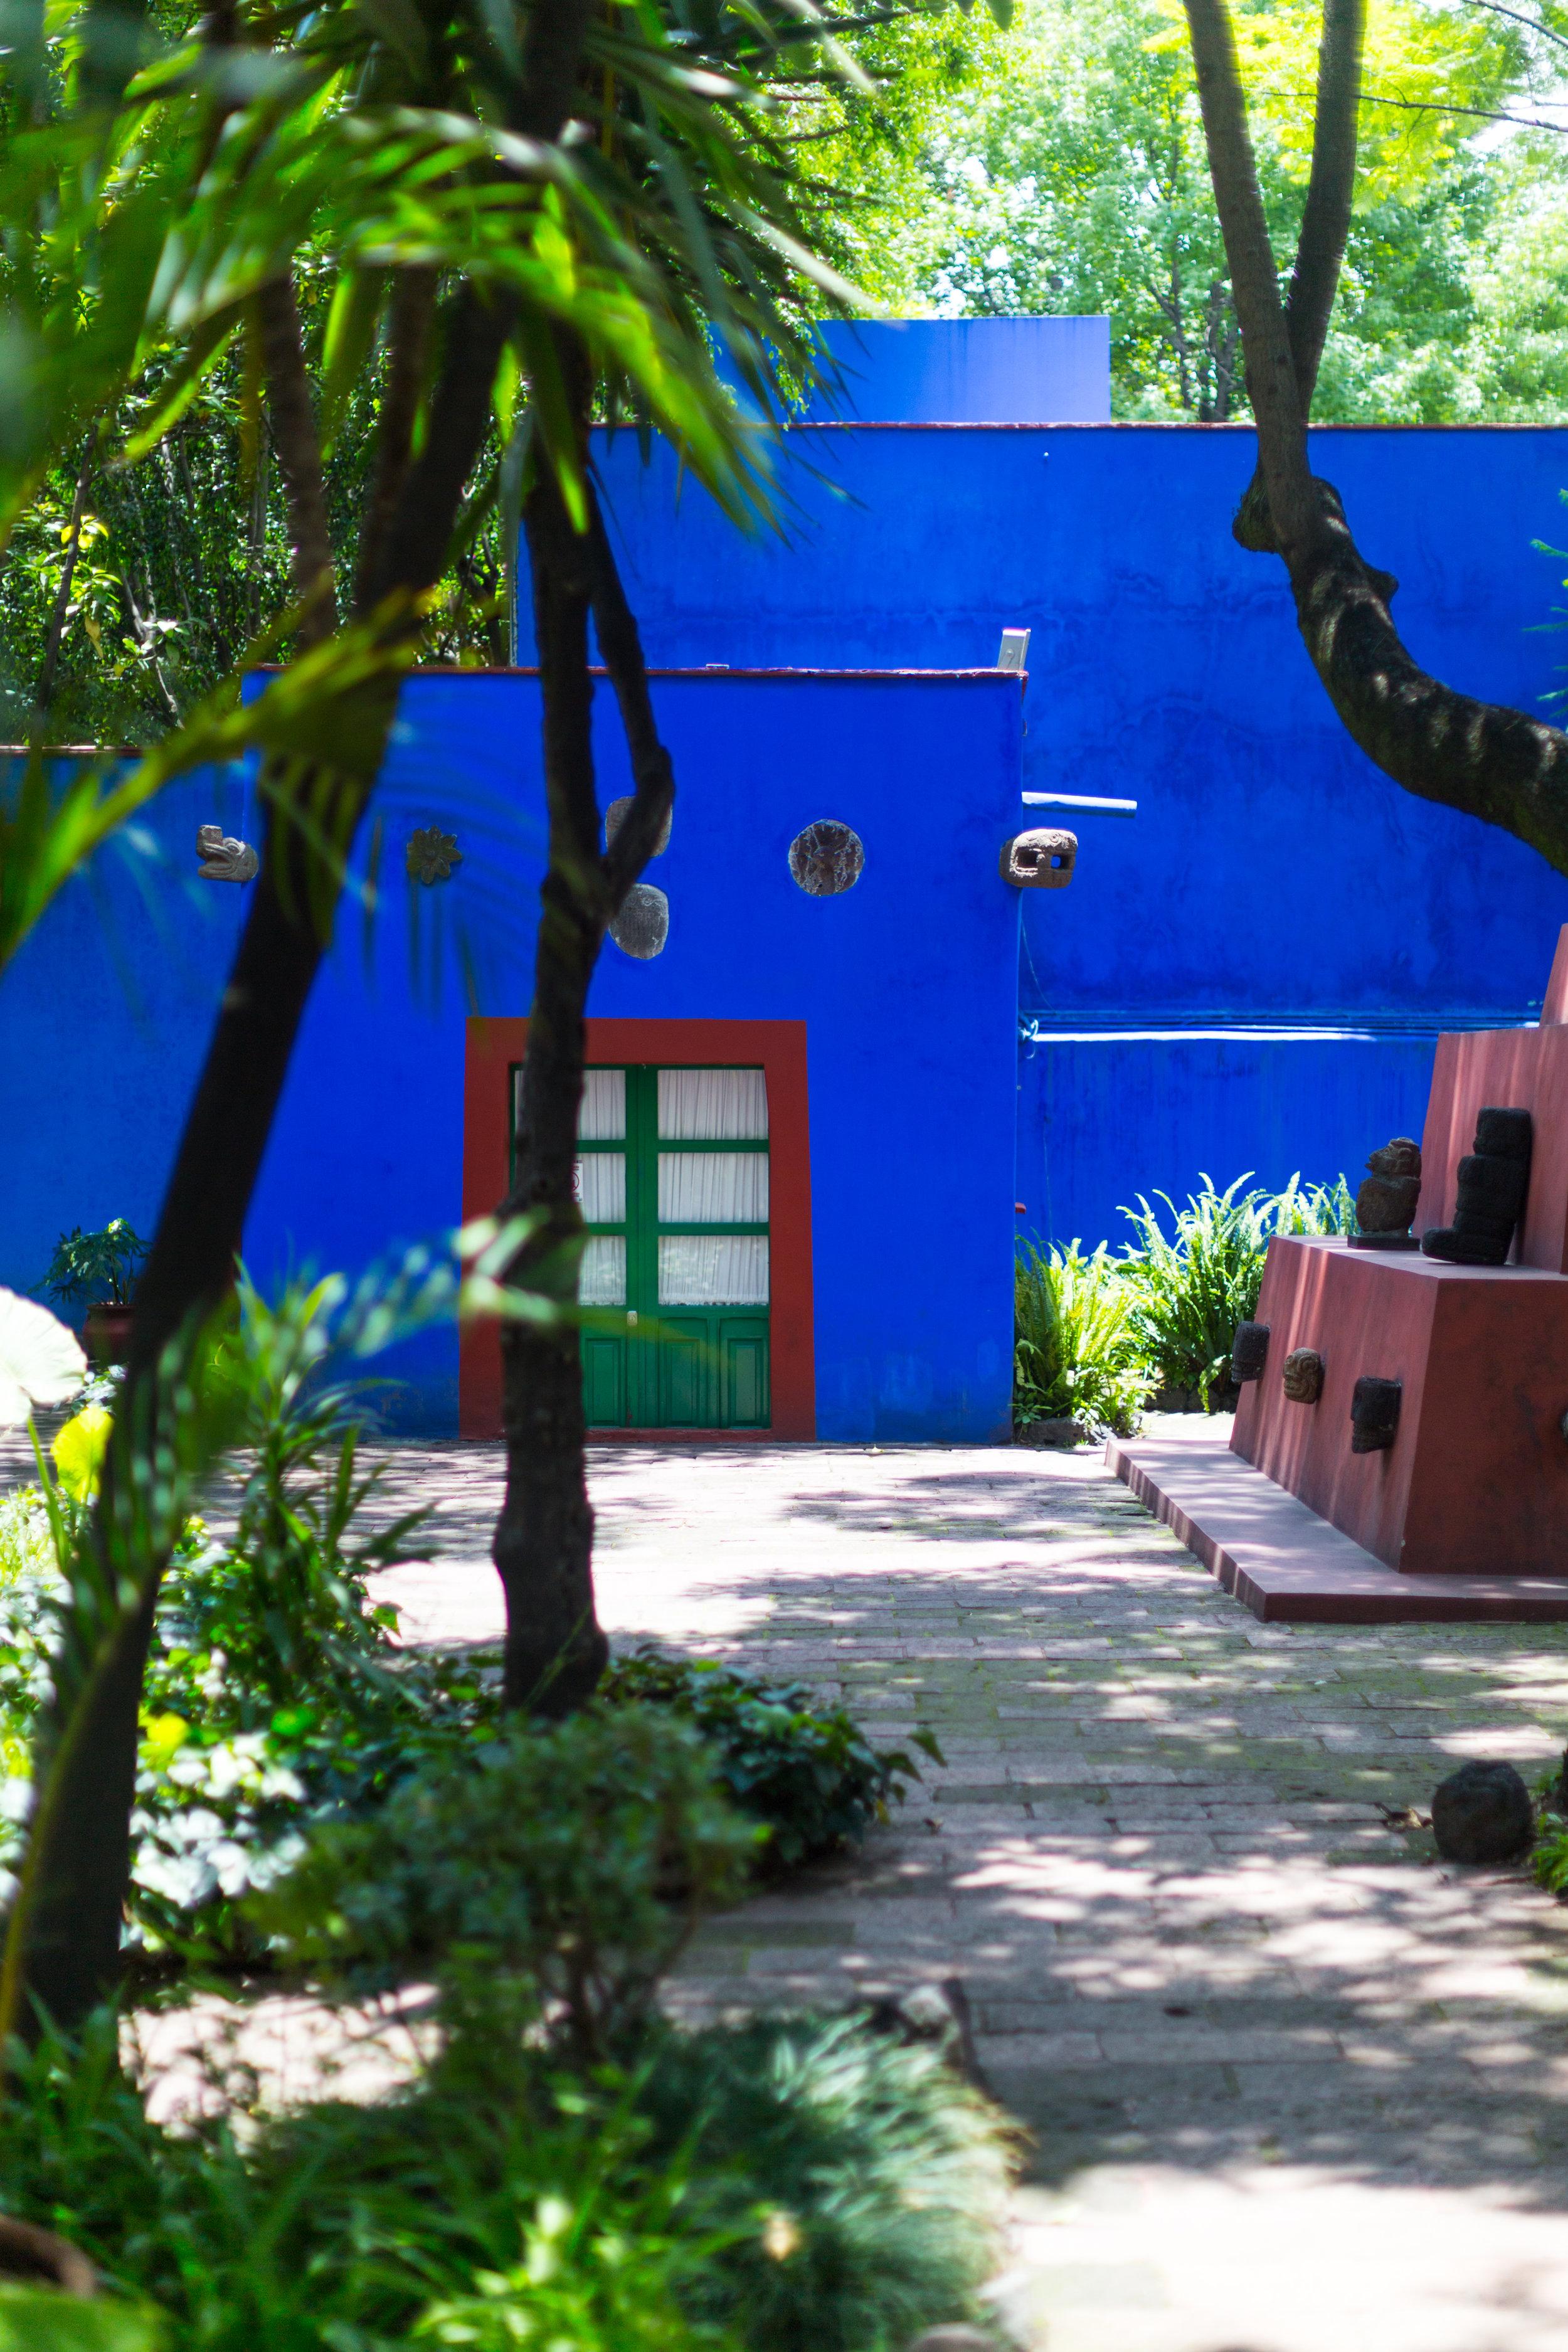 Mexico City Frida Kahlo La Casa Azul-5.jpg